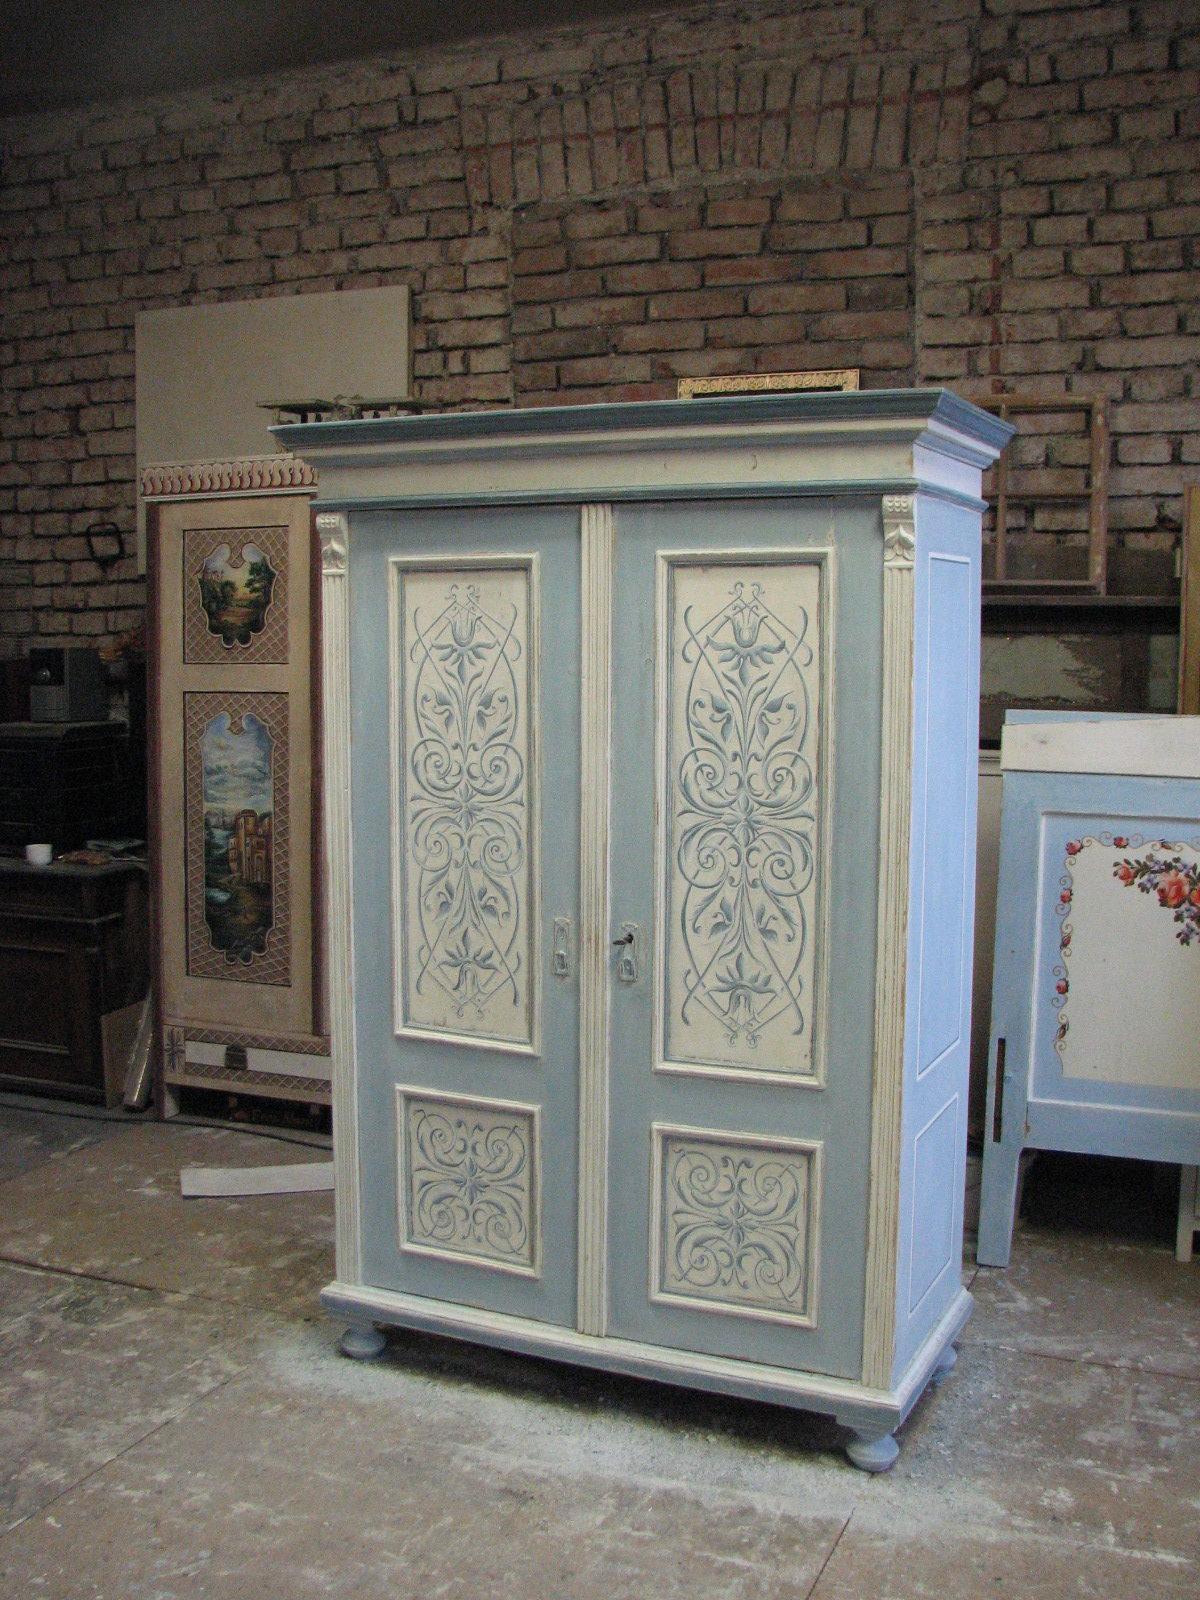 Malovaná šedo-modrá skříň s ornamentem 2